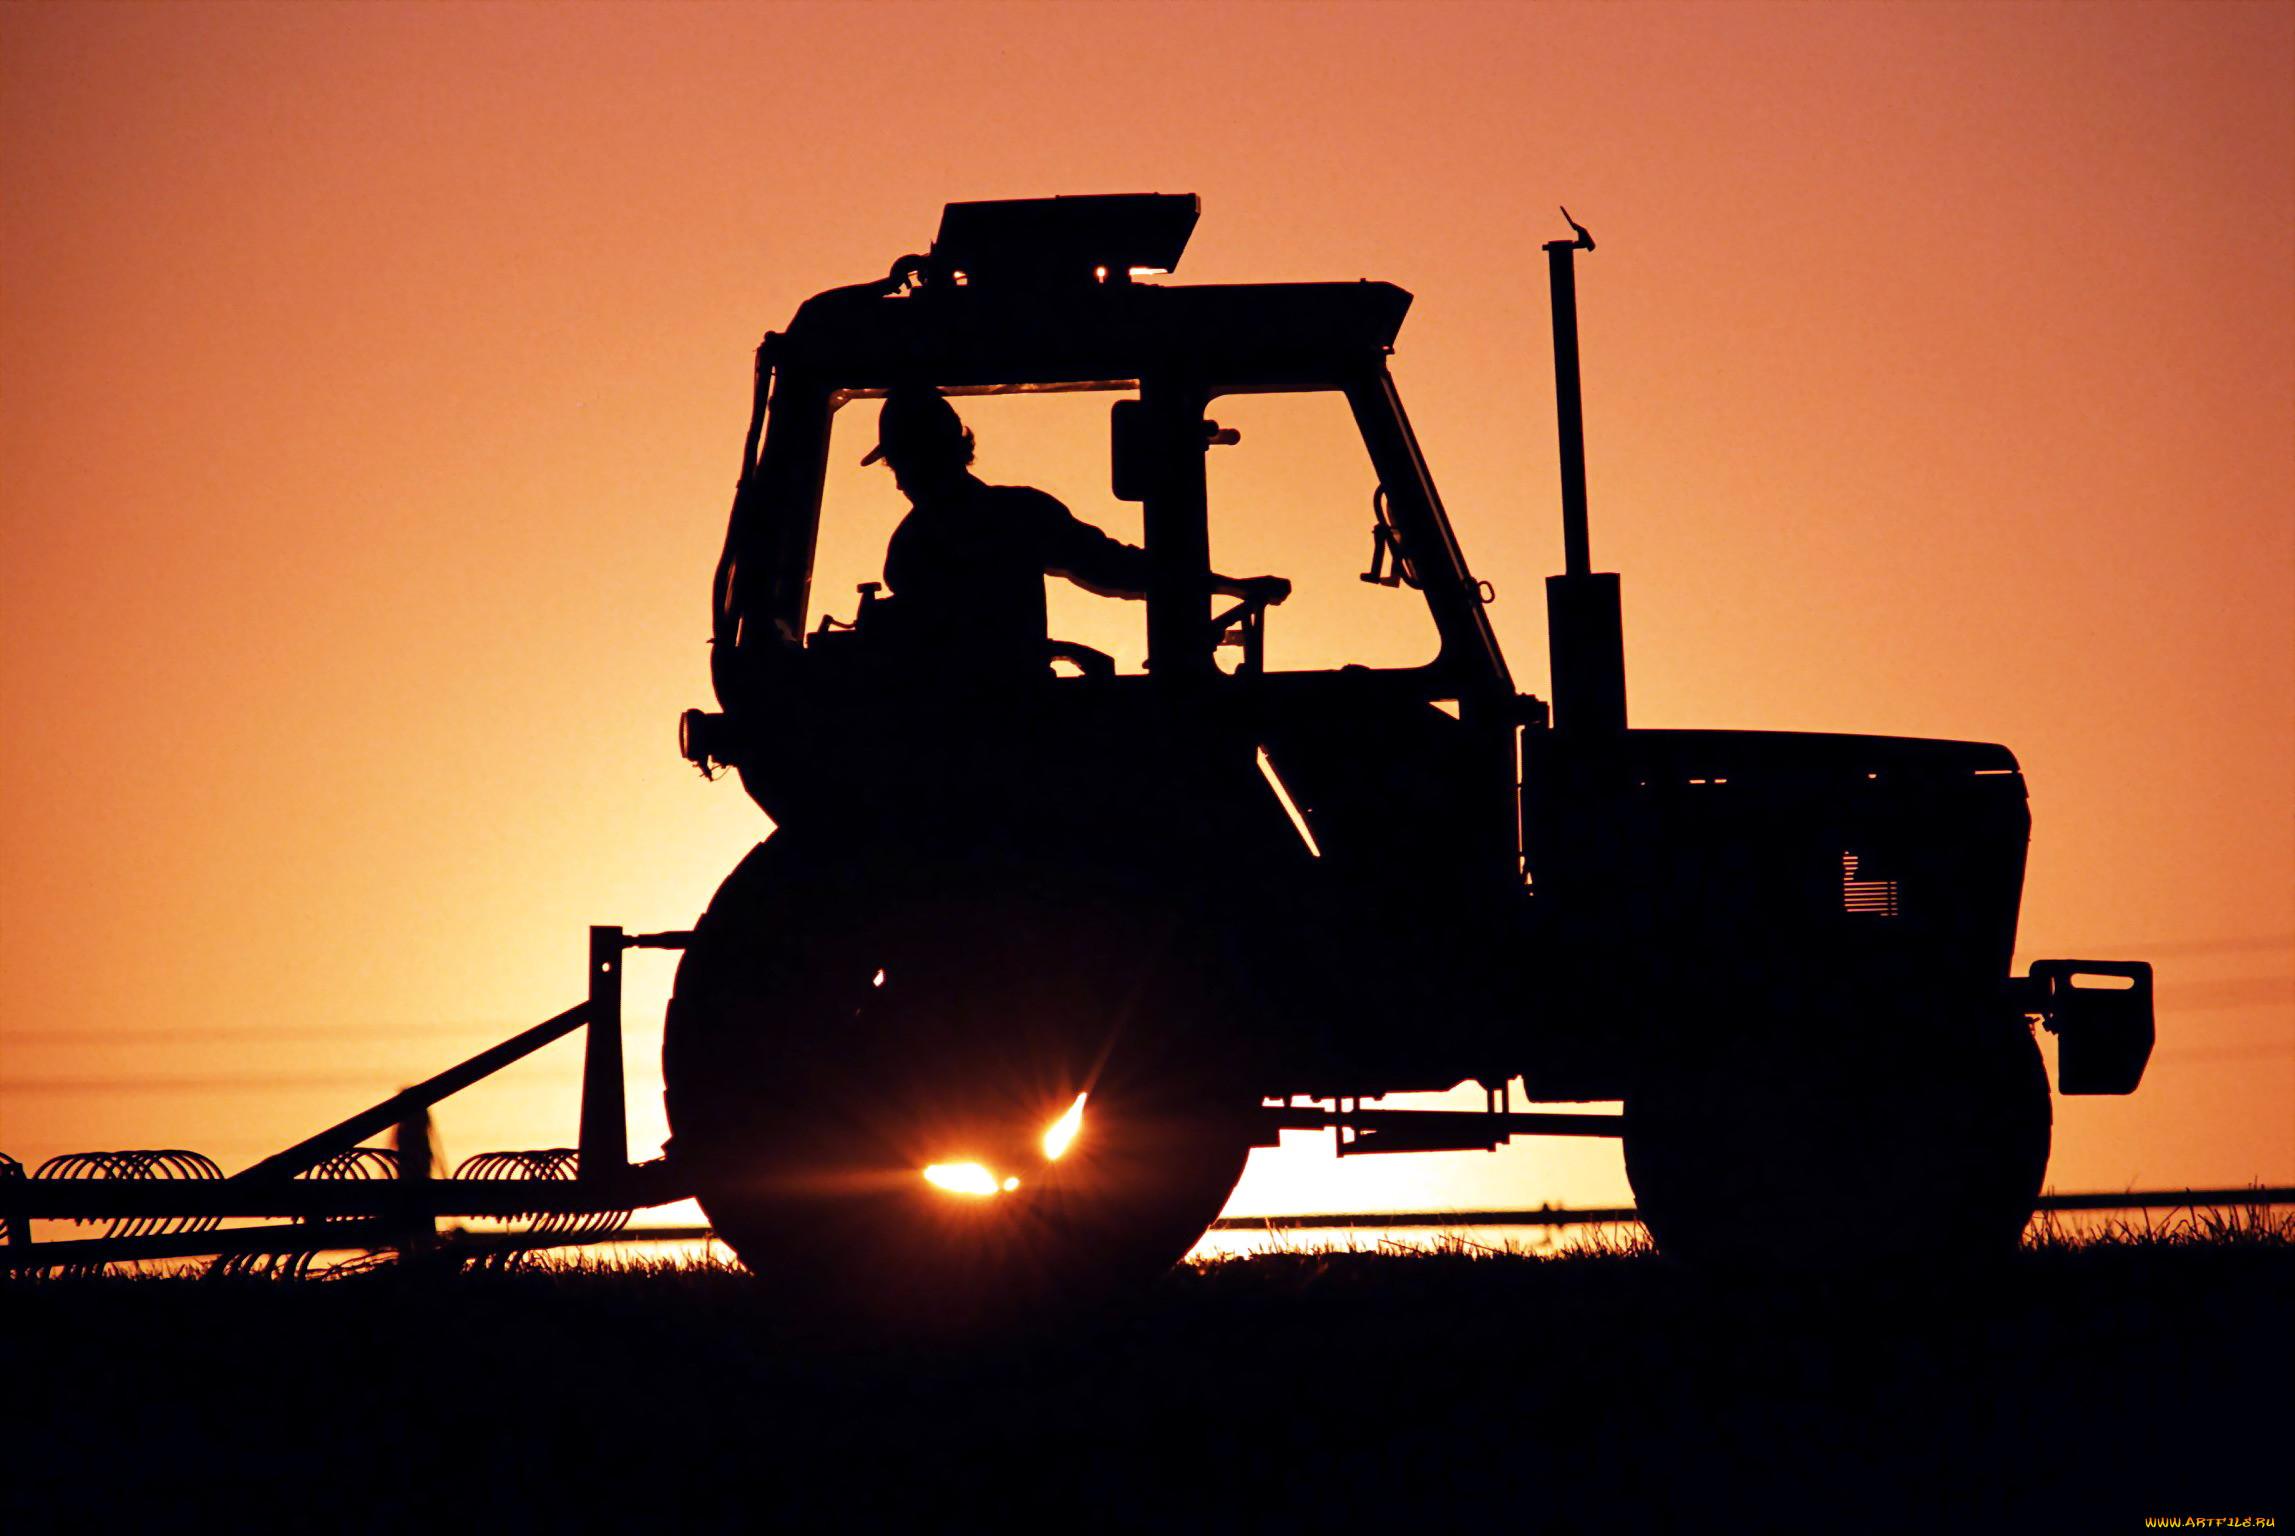 техника, тракторы, трактор, закат, борона, тракторист, силуэты